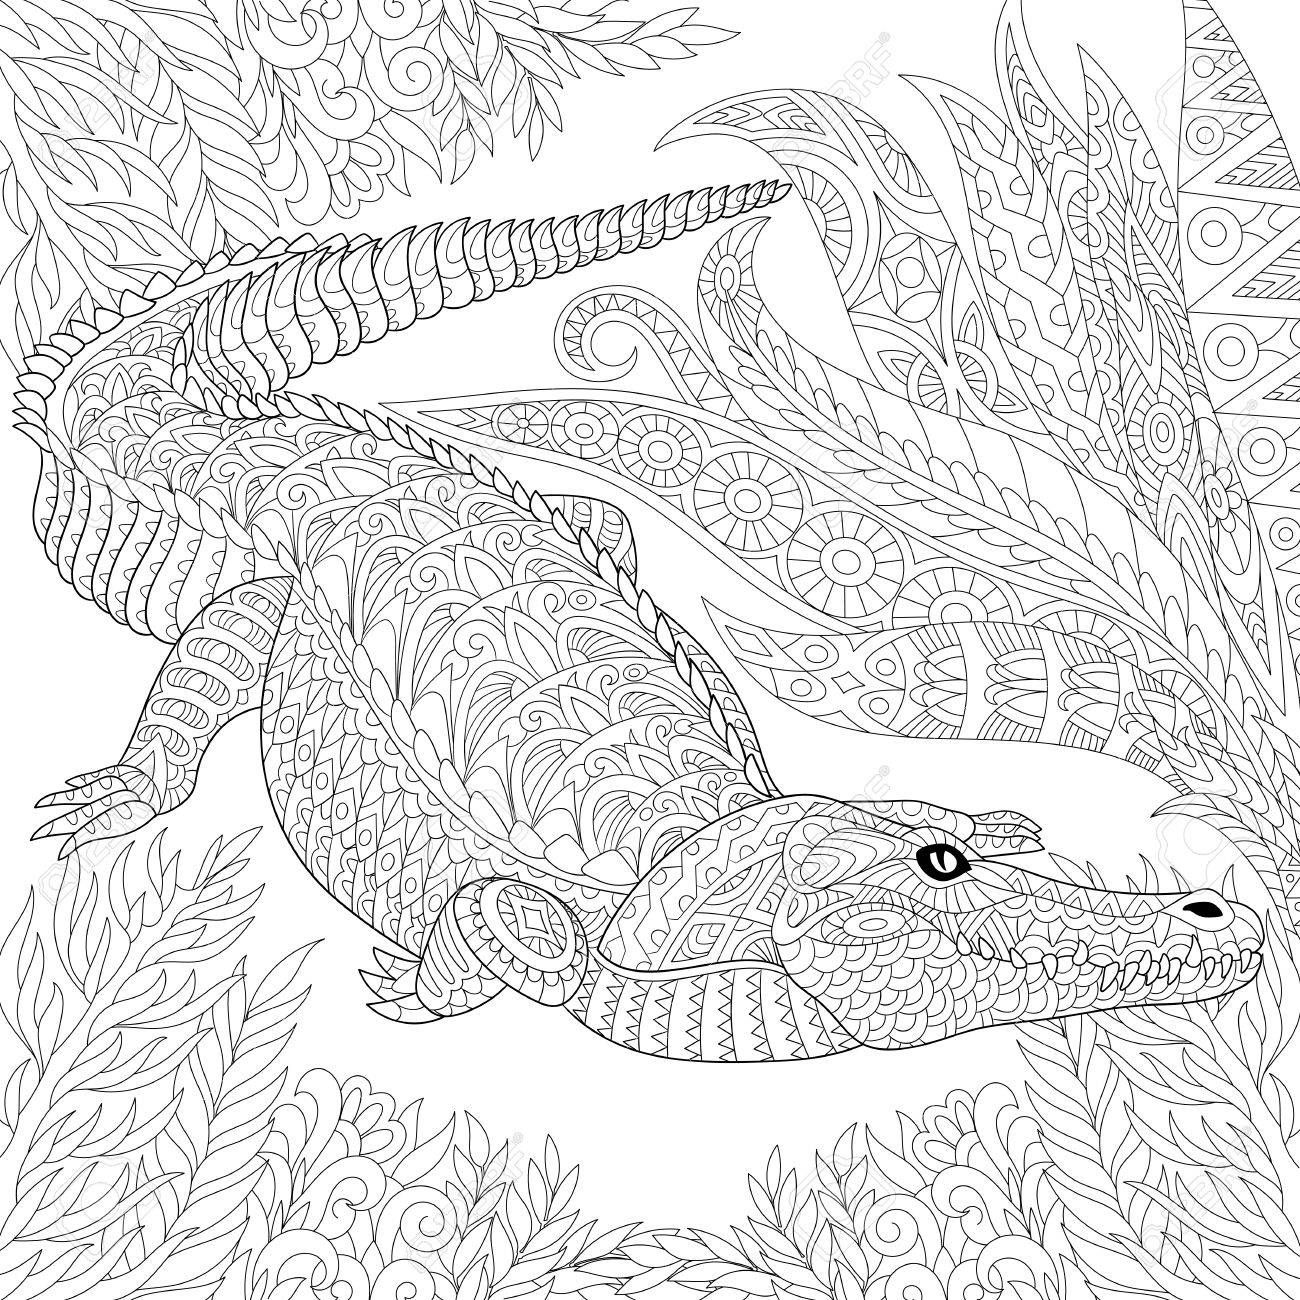 Stock Photo Adult Coloring Krokodil Dschungel Und Malvorlagen